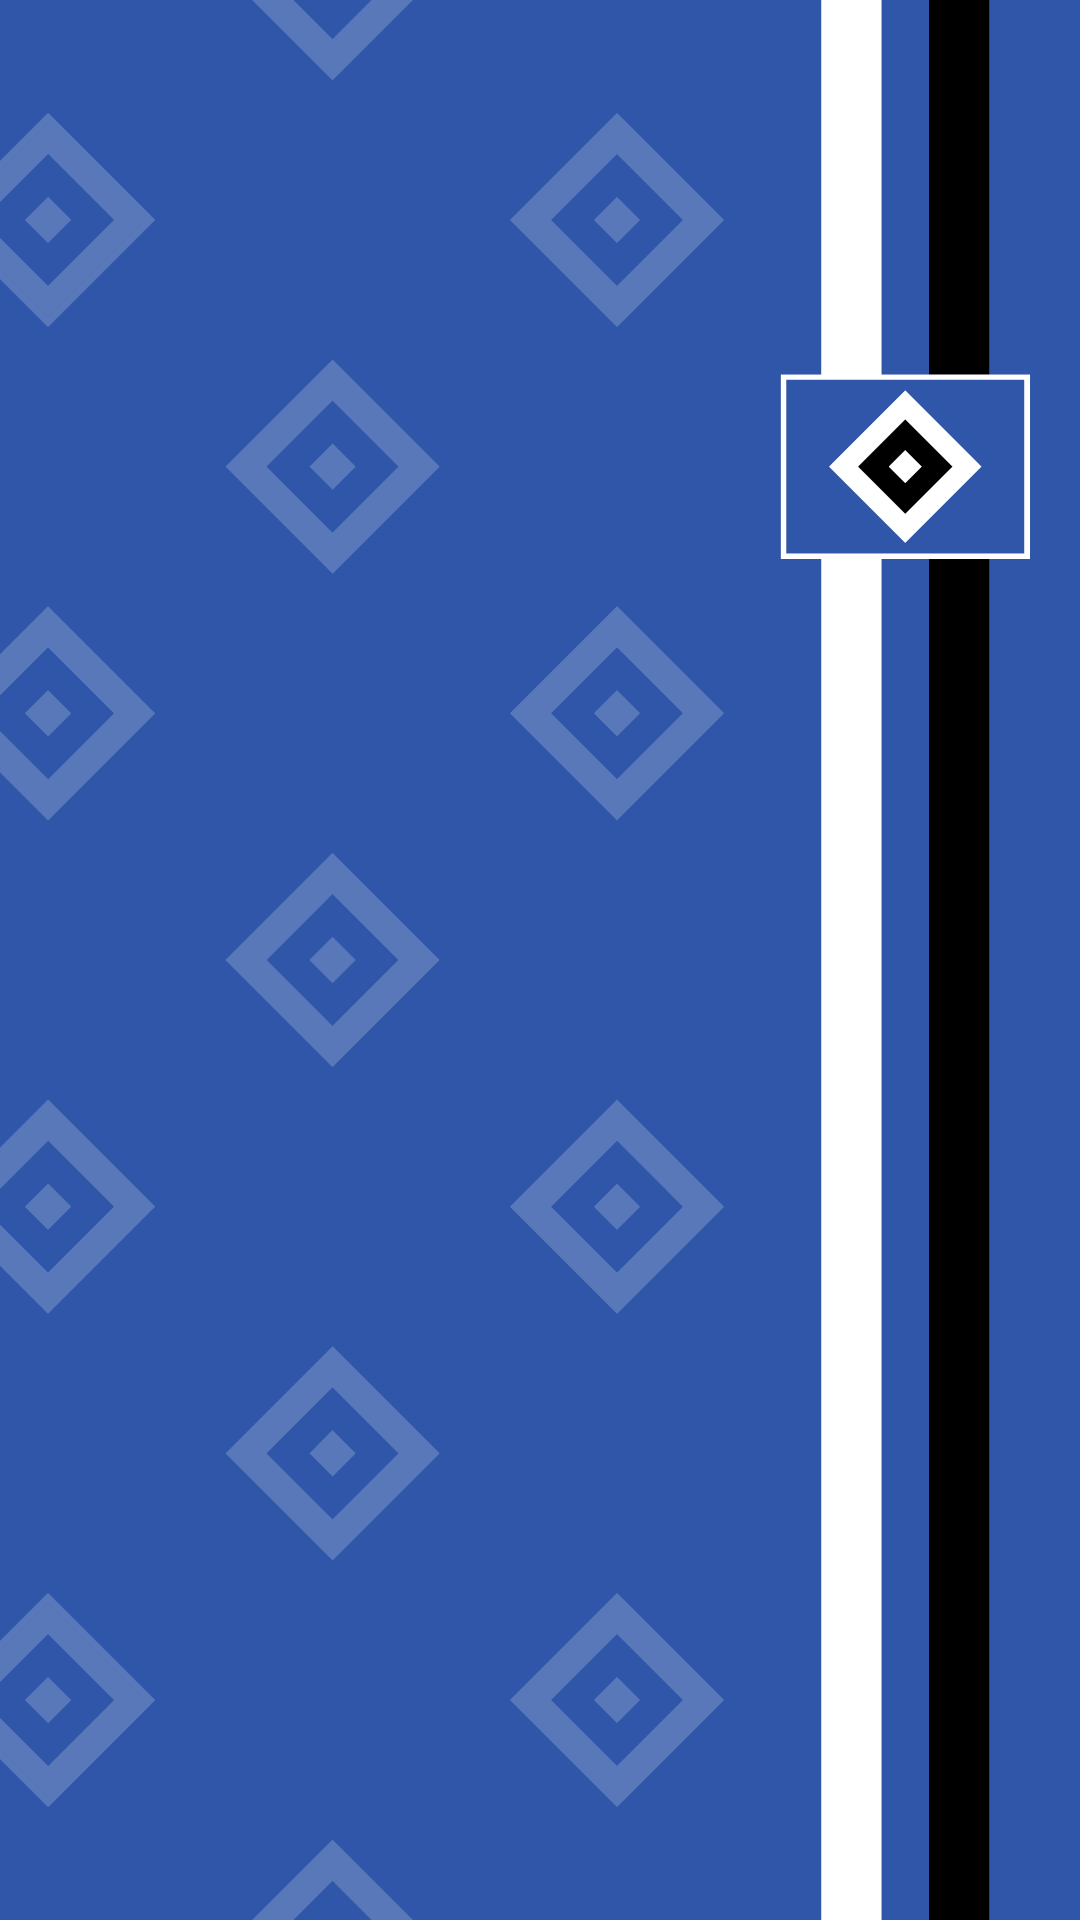 HSV-Wallpaper | HSV de